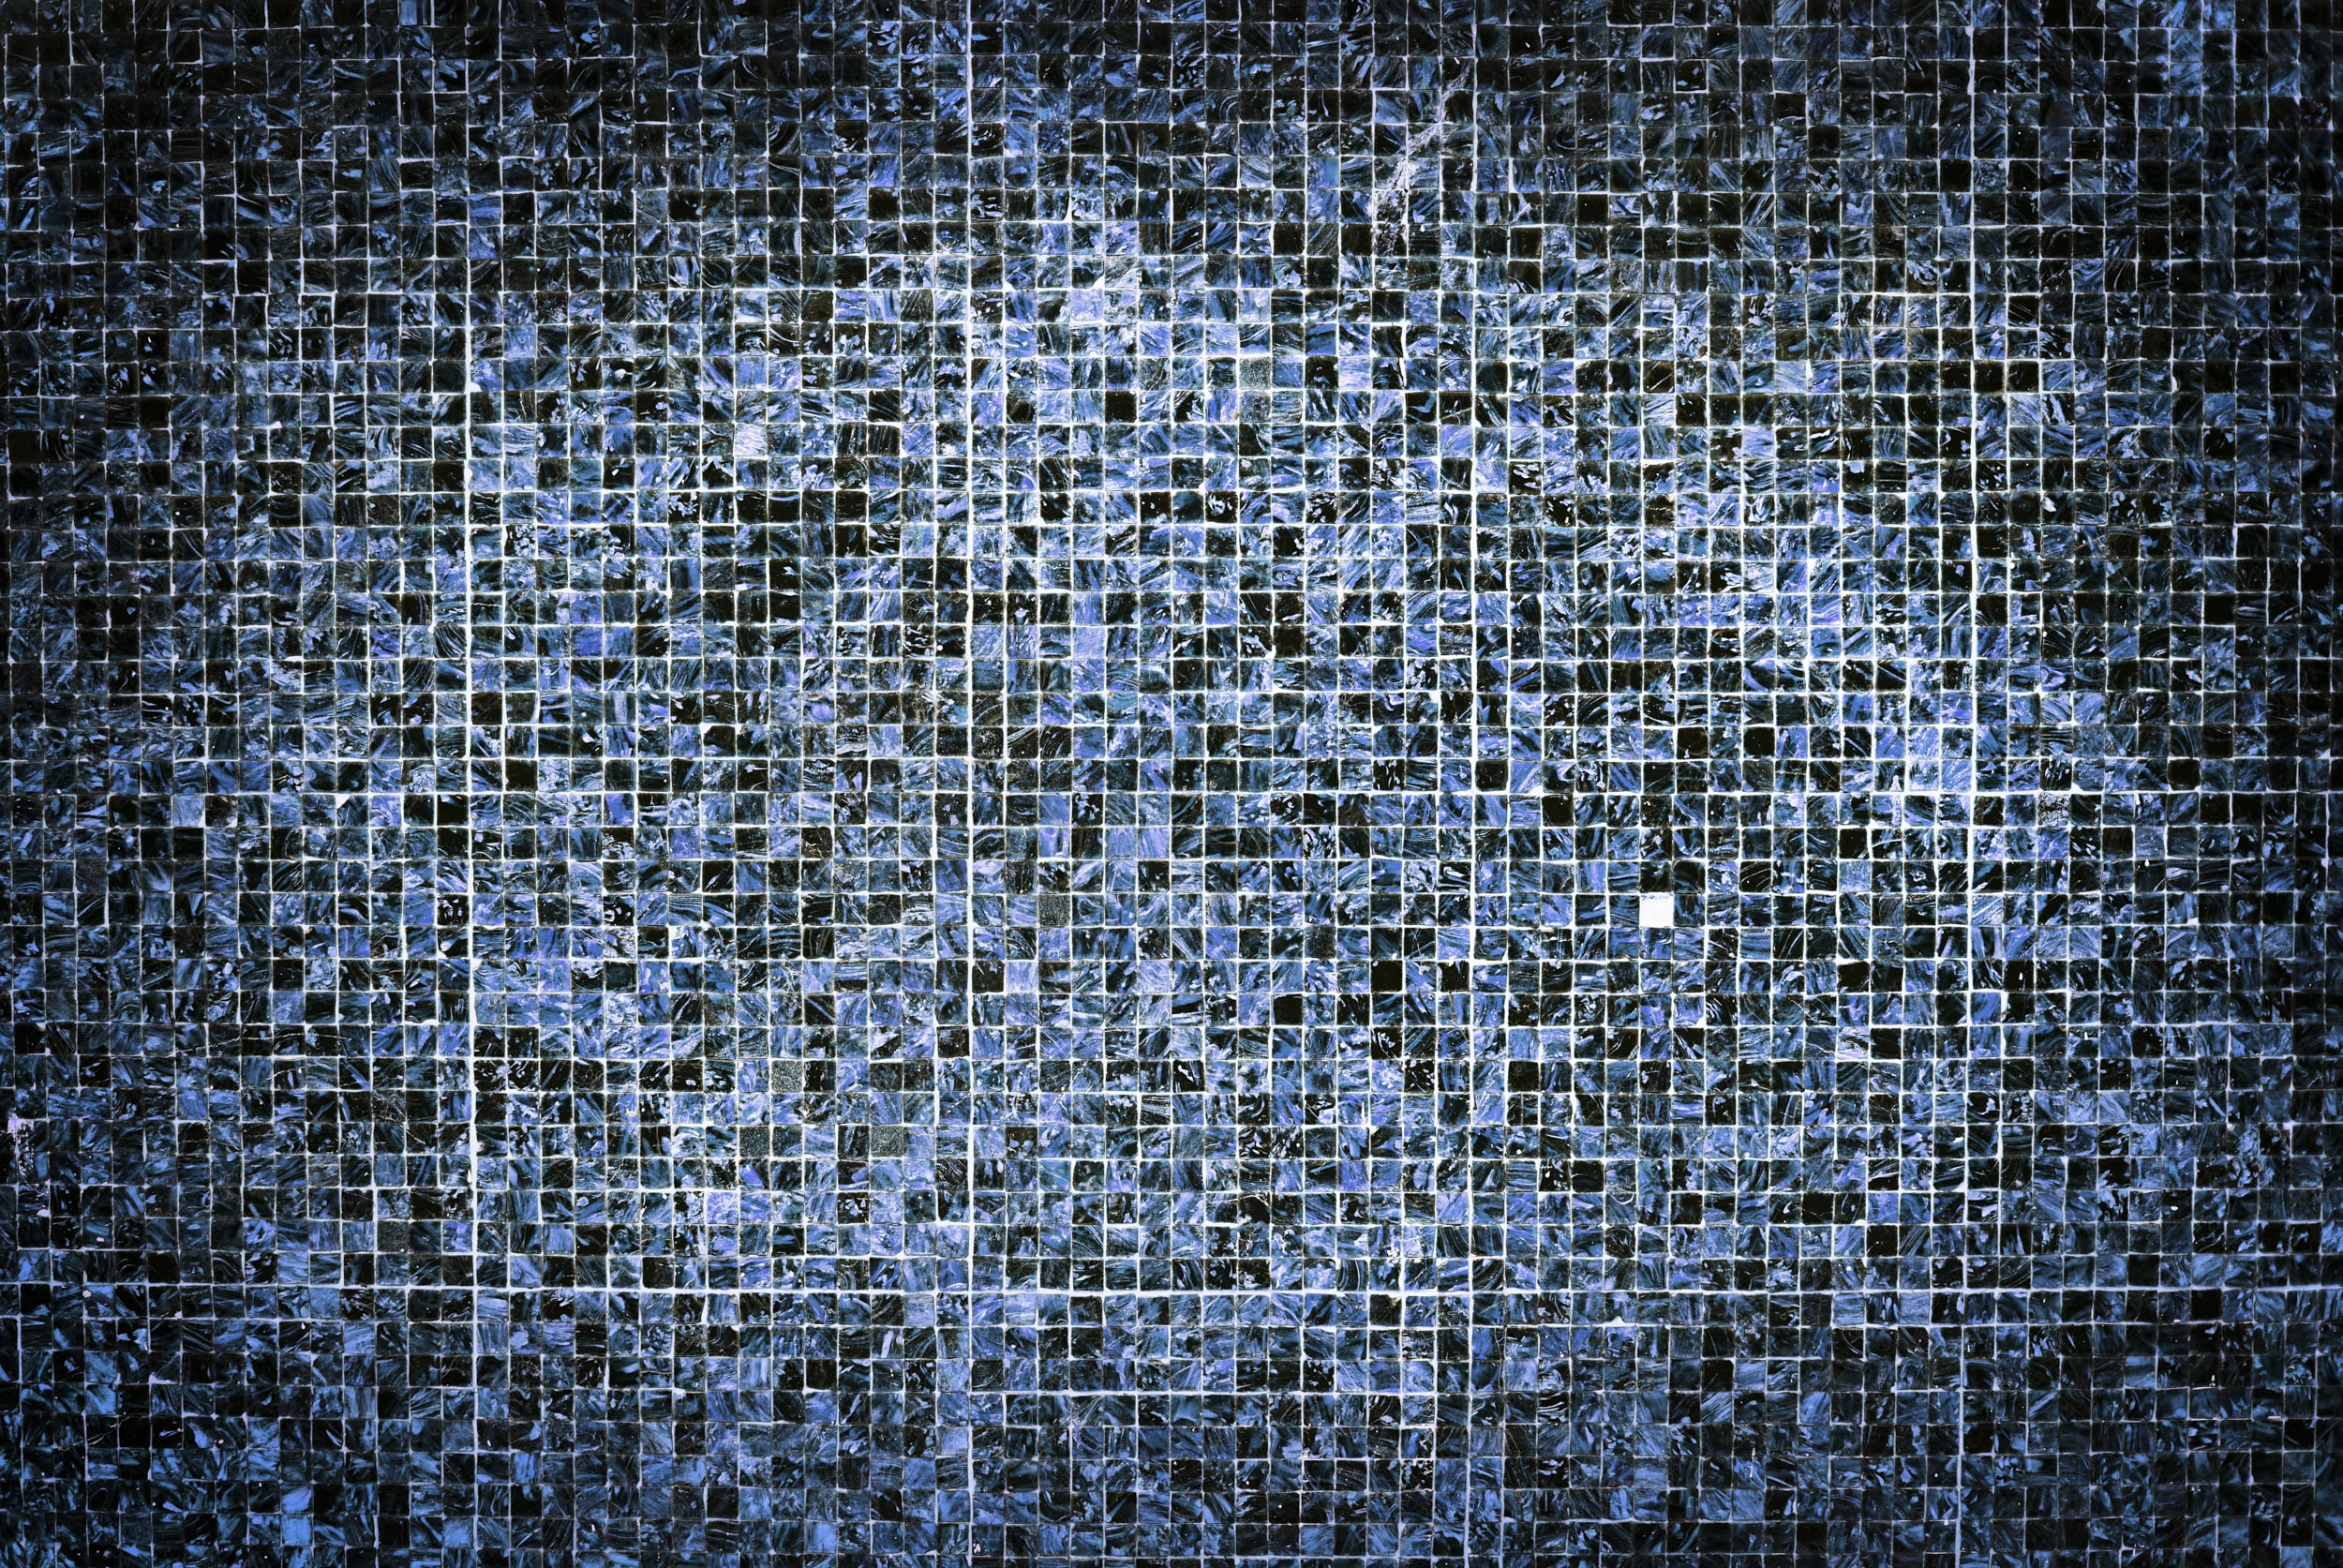 gray and black tiles